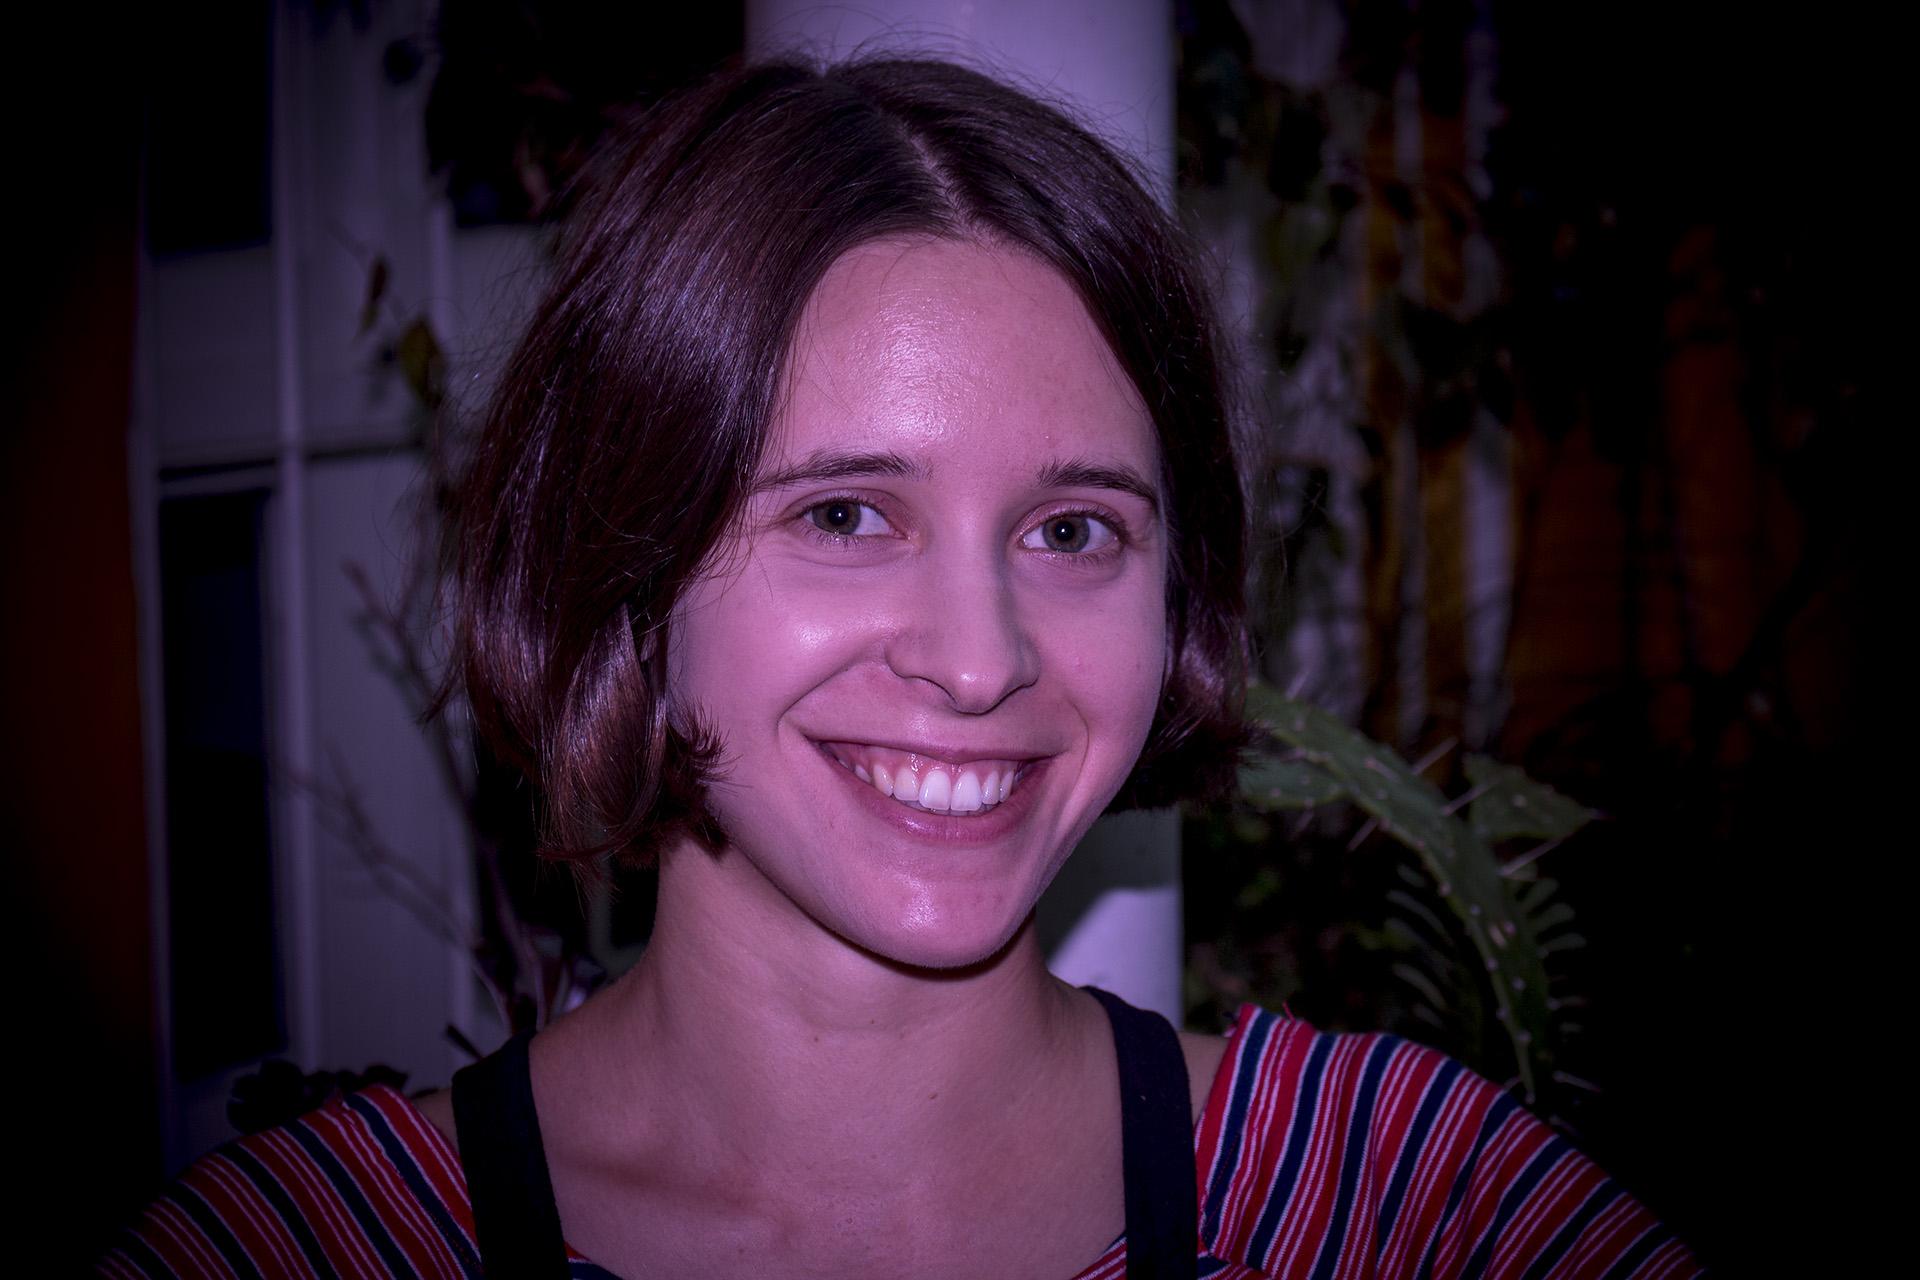 Tani-Perfiles-03-04-18-Natalia-Vidal-Solo-Para-Entendidos_33.jpg